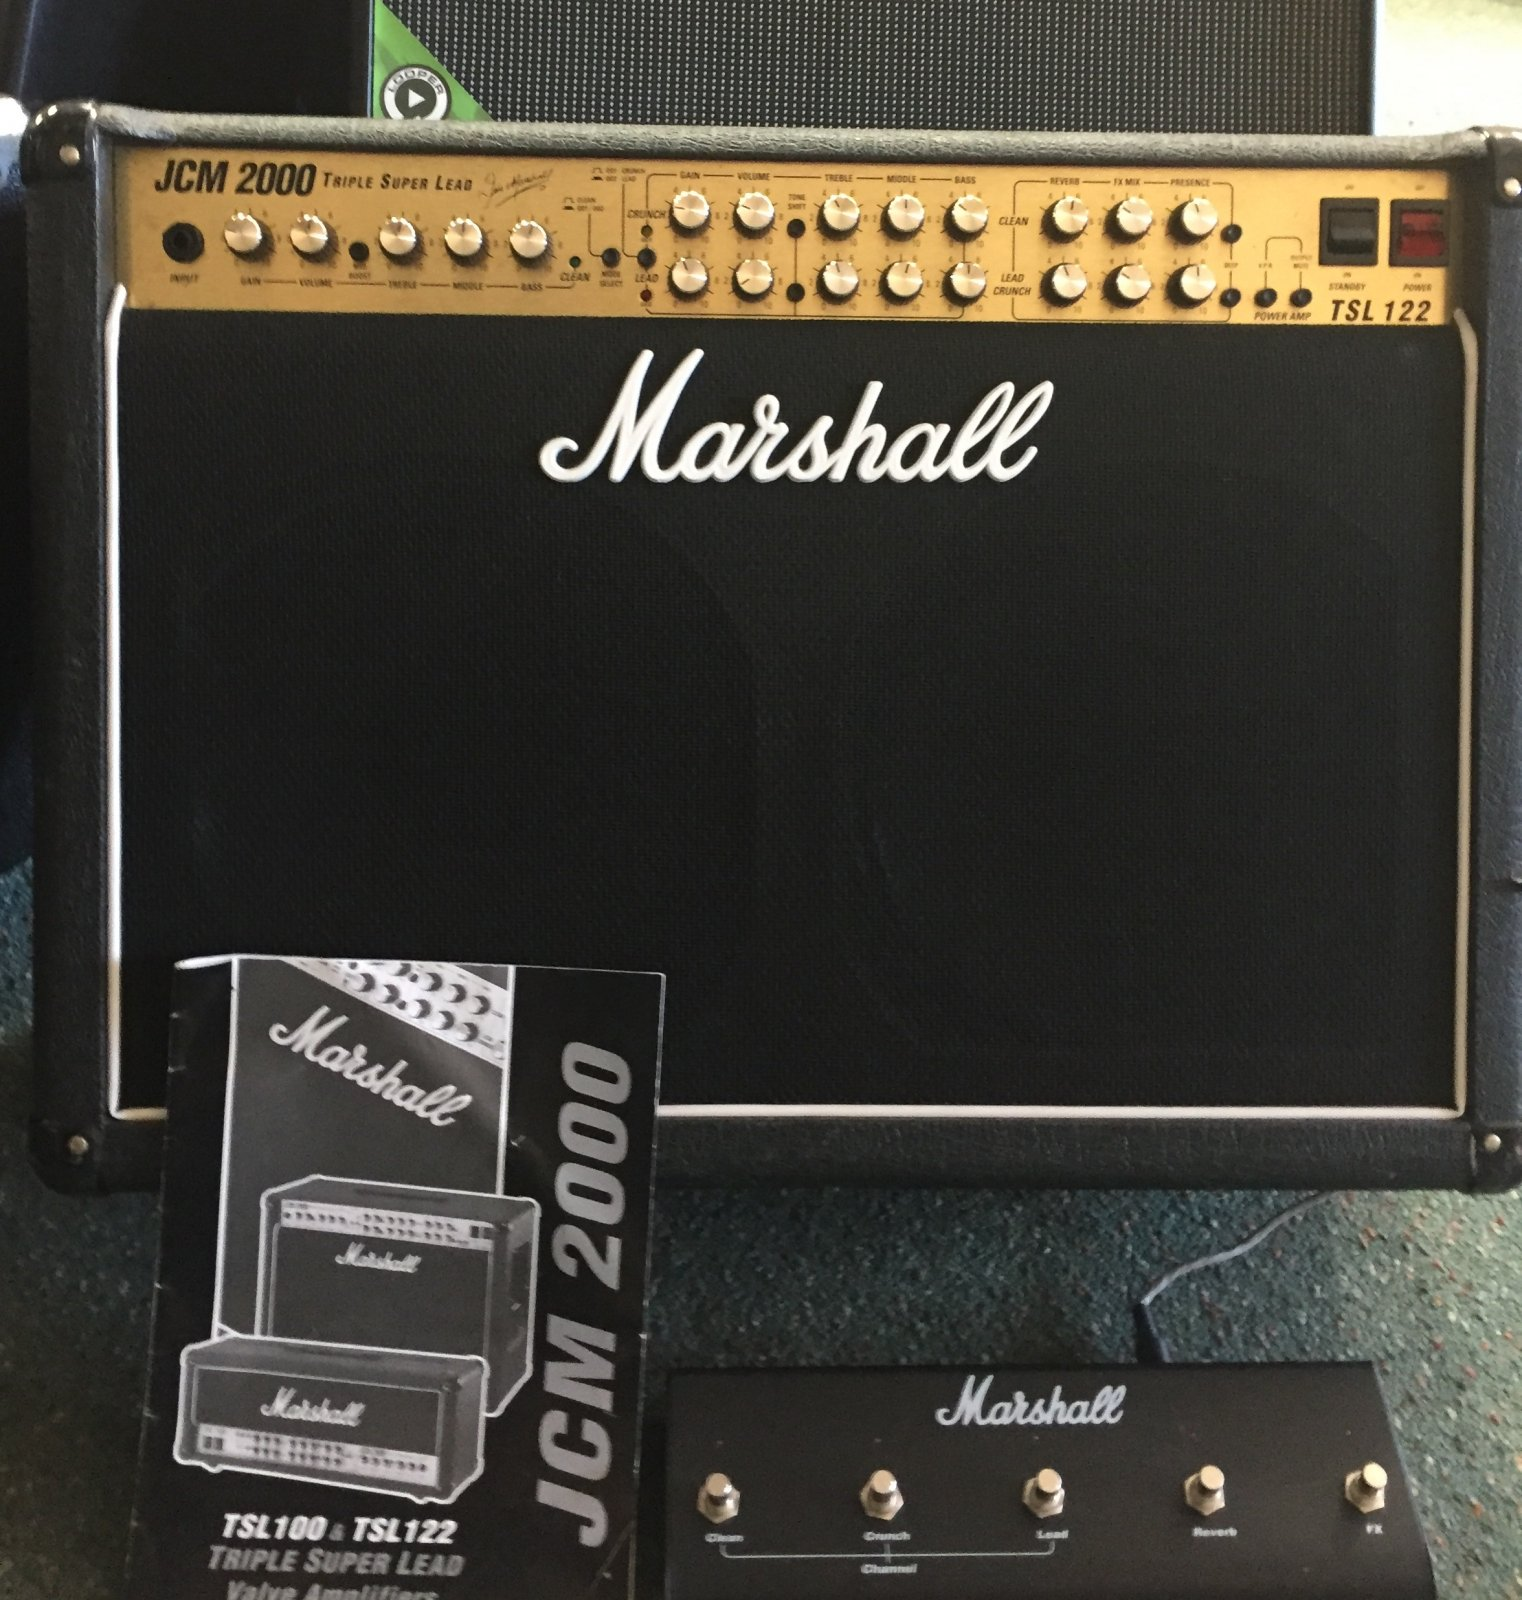 MARSHALL JCM2000 TSL122 USED 3 CH 2X12 COMBO